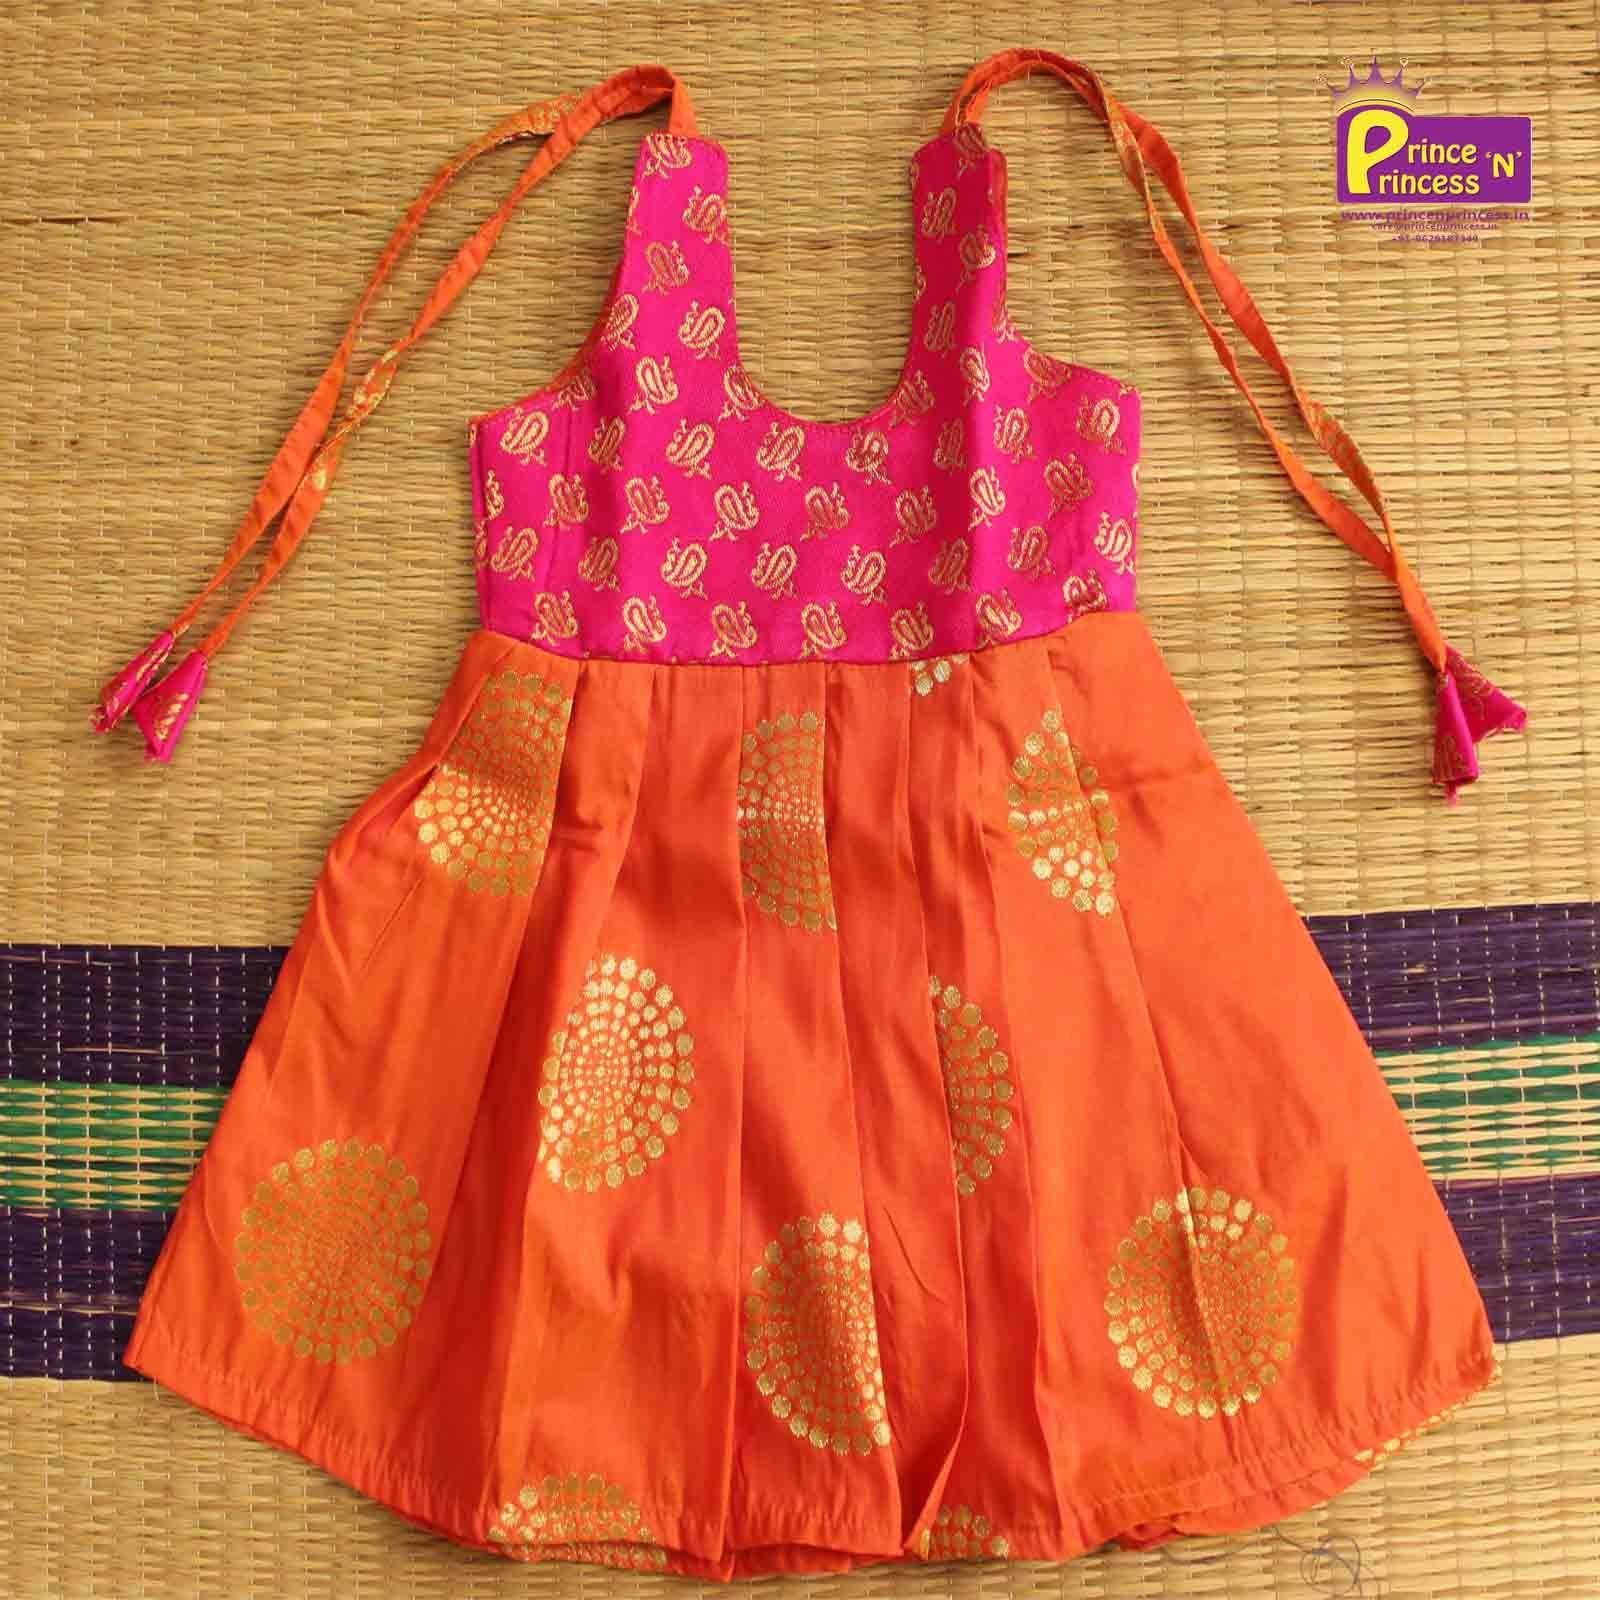 New Born Blue Kids Frock For Naming And Cradle Ceremony Kids Pattu Pavadai Pattu Langa Kids Blouse Designs Baby Frocks Designs Kids Frocks Design